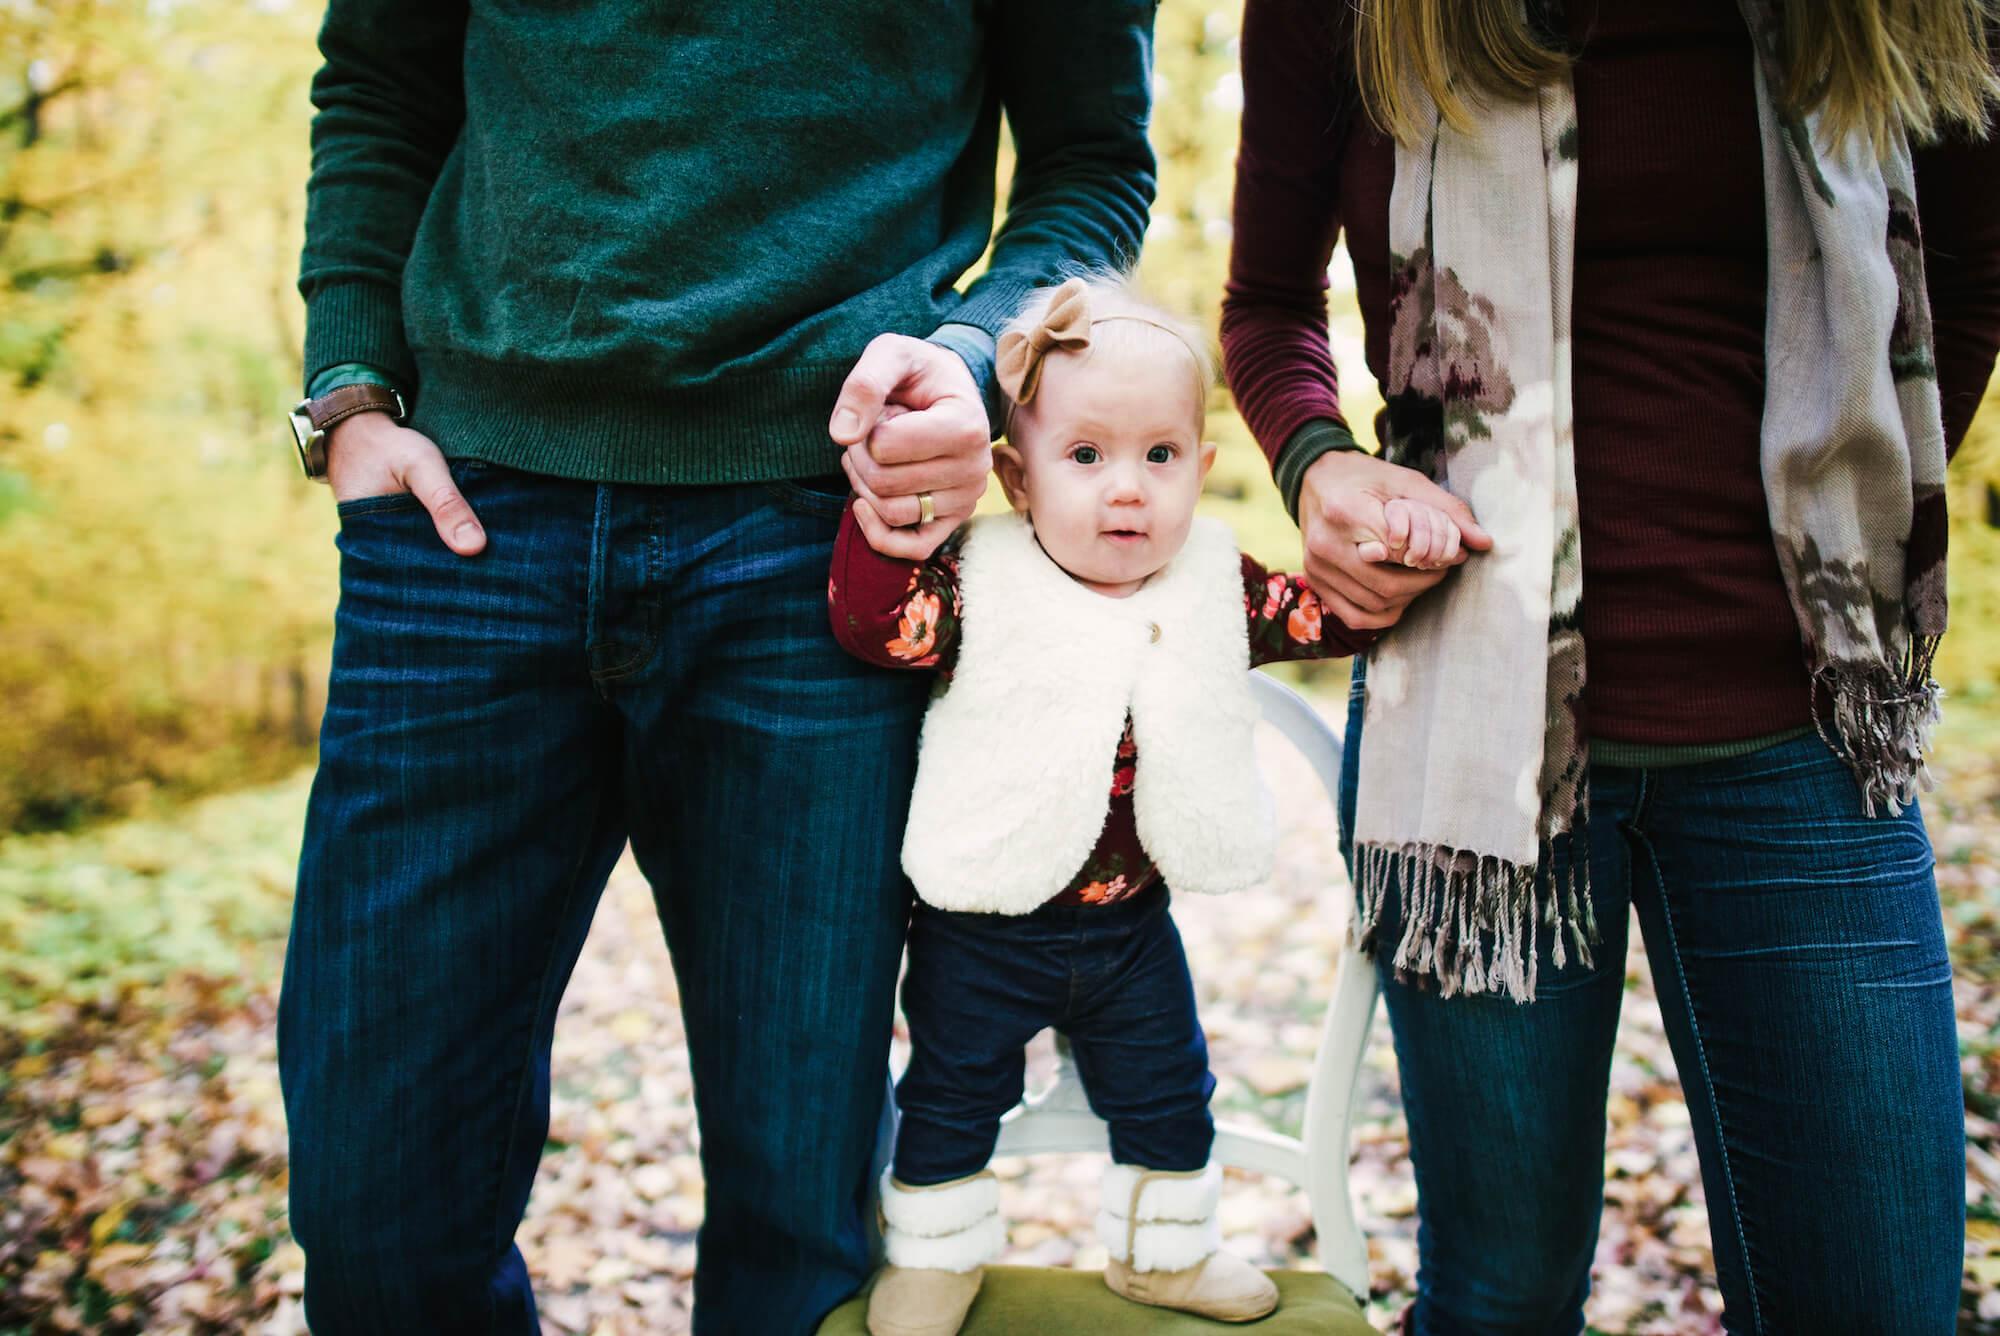 engle-olson-family-photography-session-5.jpg